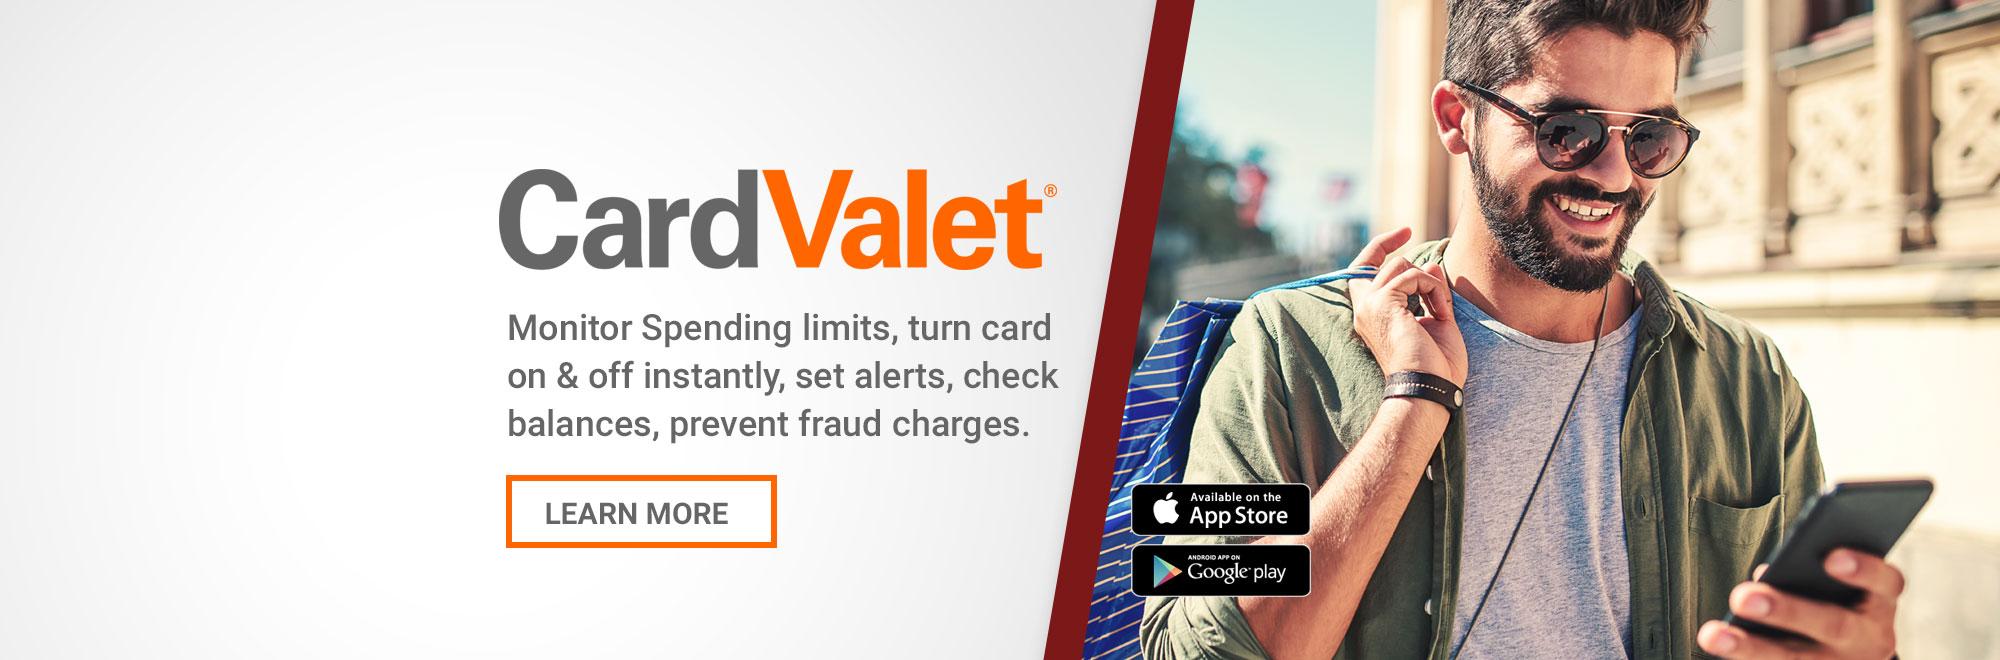 CardValet - Monitor Spending Limits